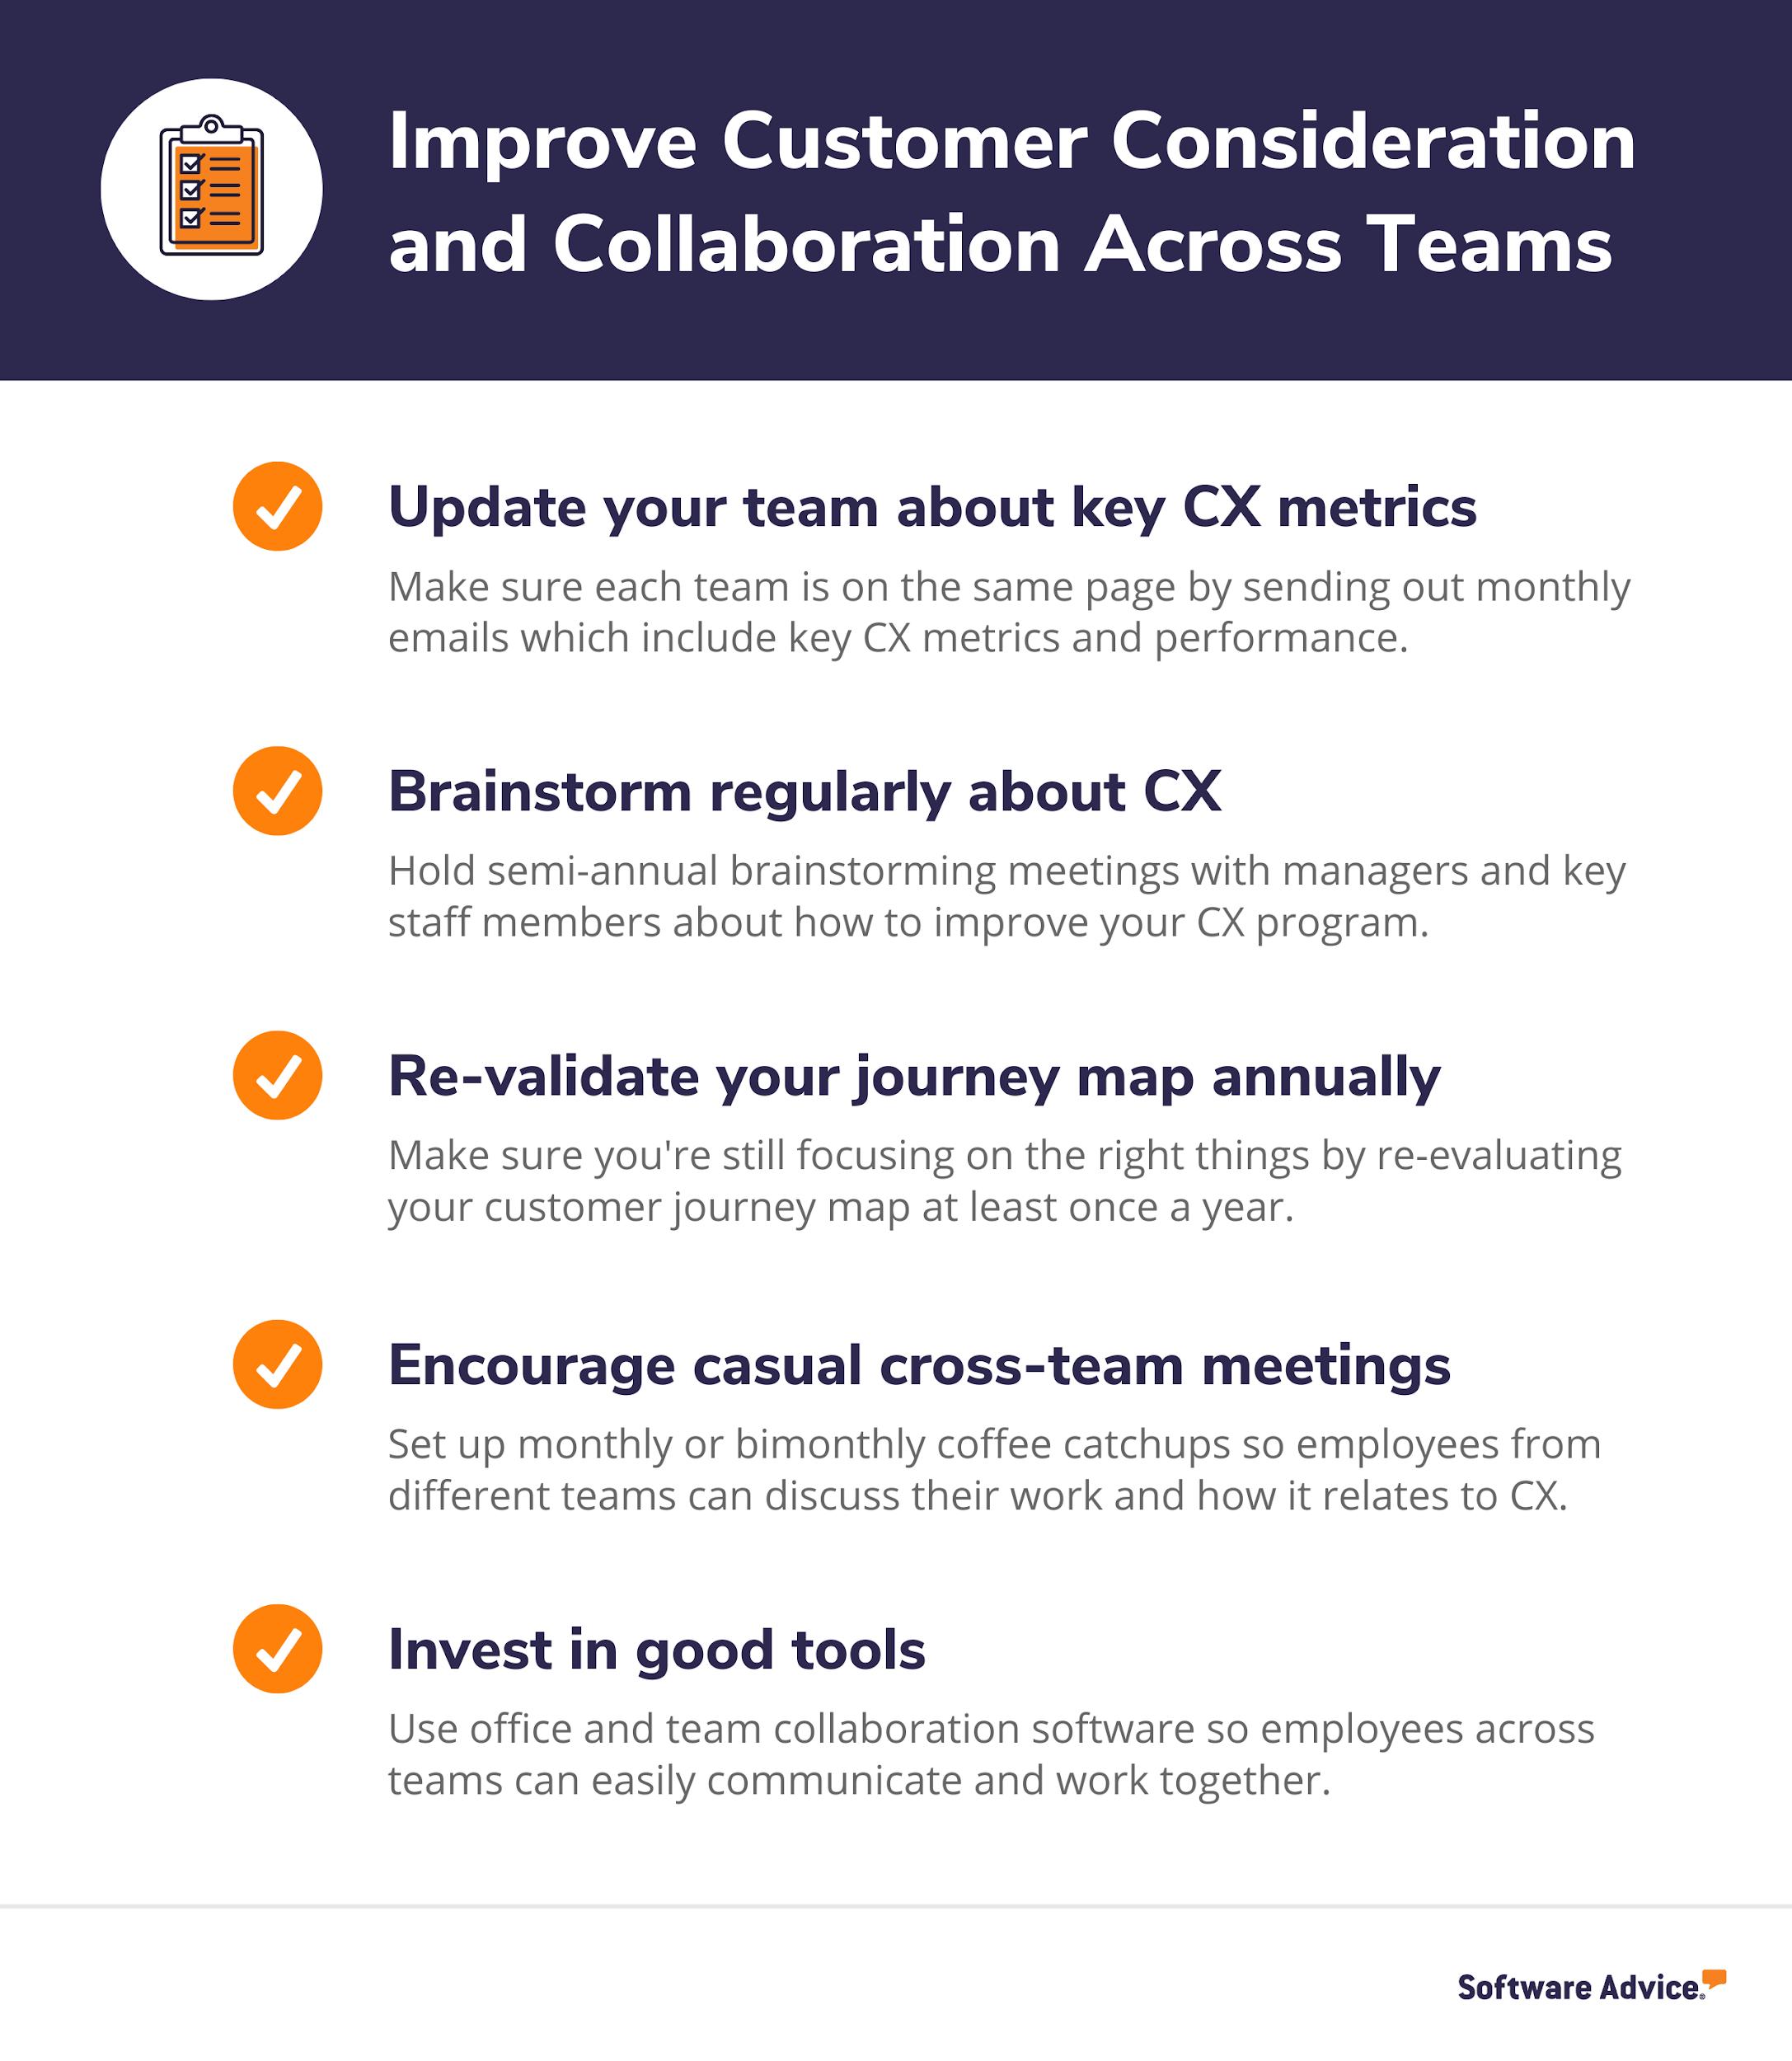 Improve employee collaboration